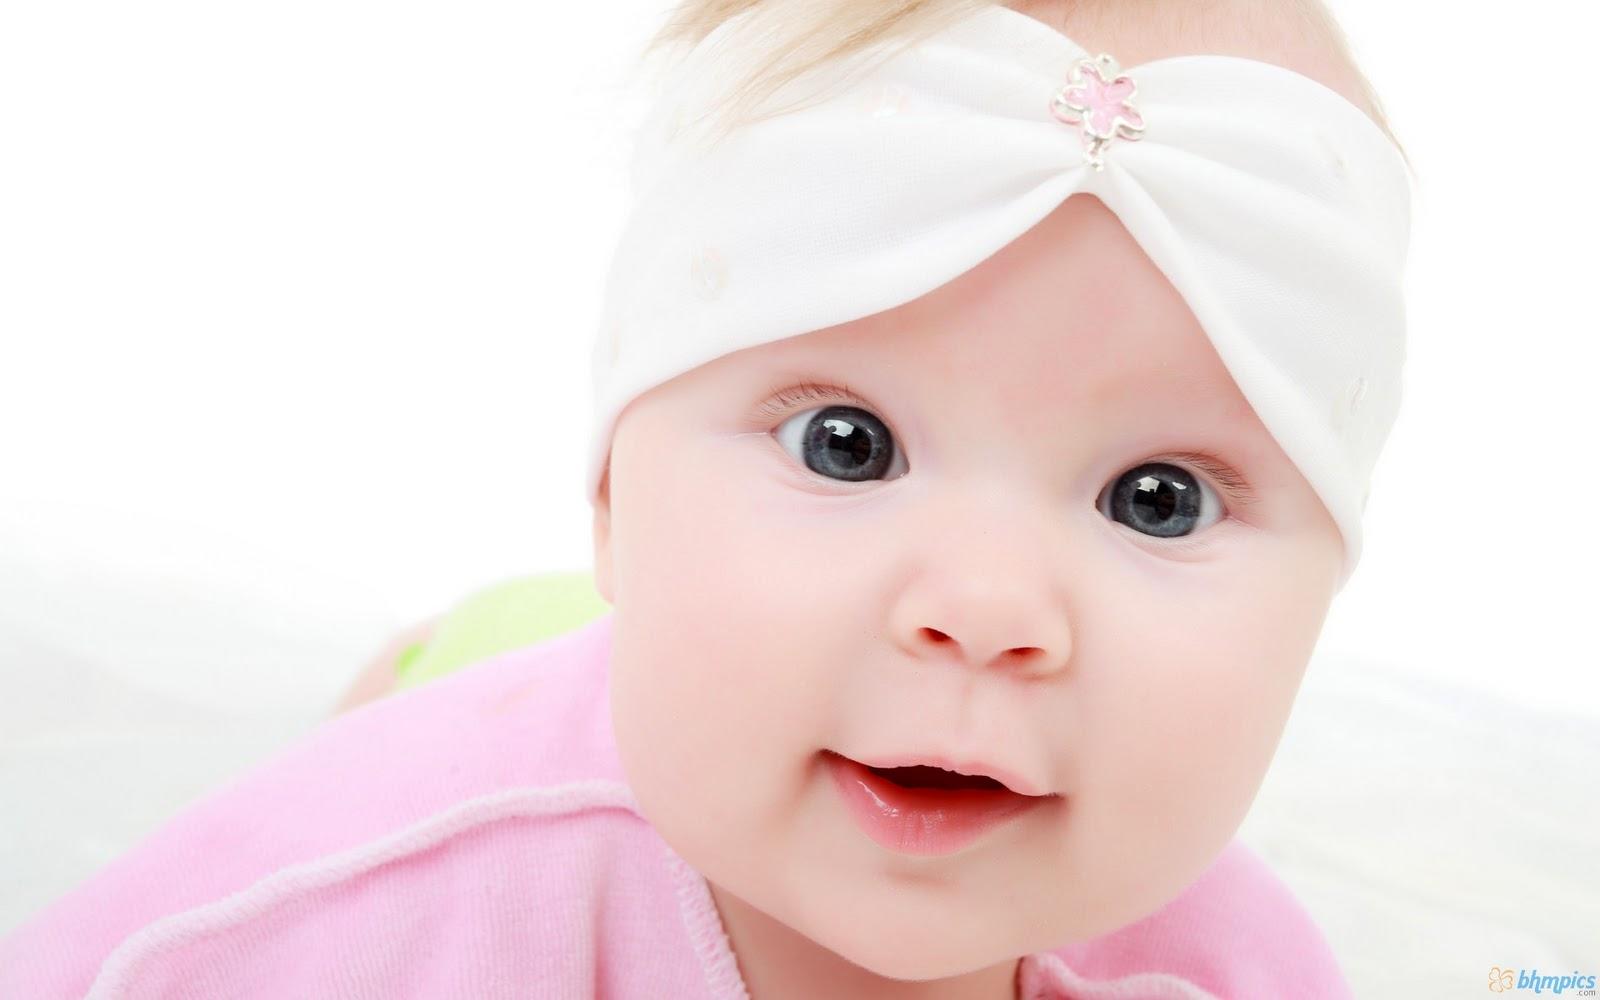 http://3.bp.blogspot.com/-9GSdJlJyMRc/Tug6jjxGEII/AAAAAAAAAcM/ScDR41BJMmQ/s1600/cute_smily_baby-1920x1200.jpg